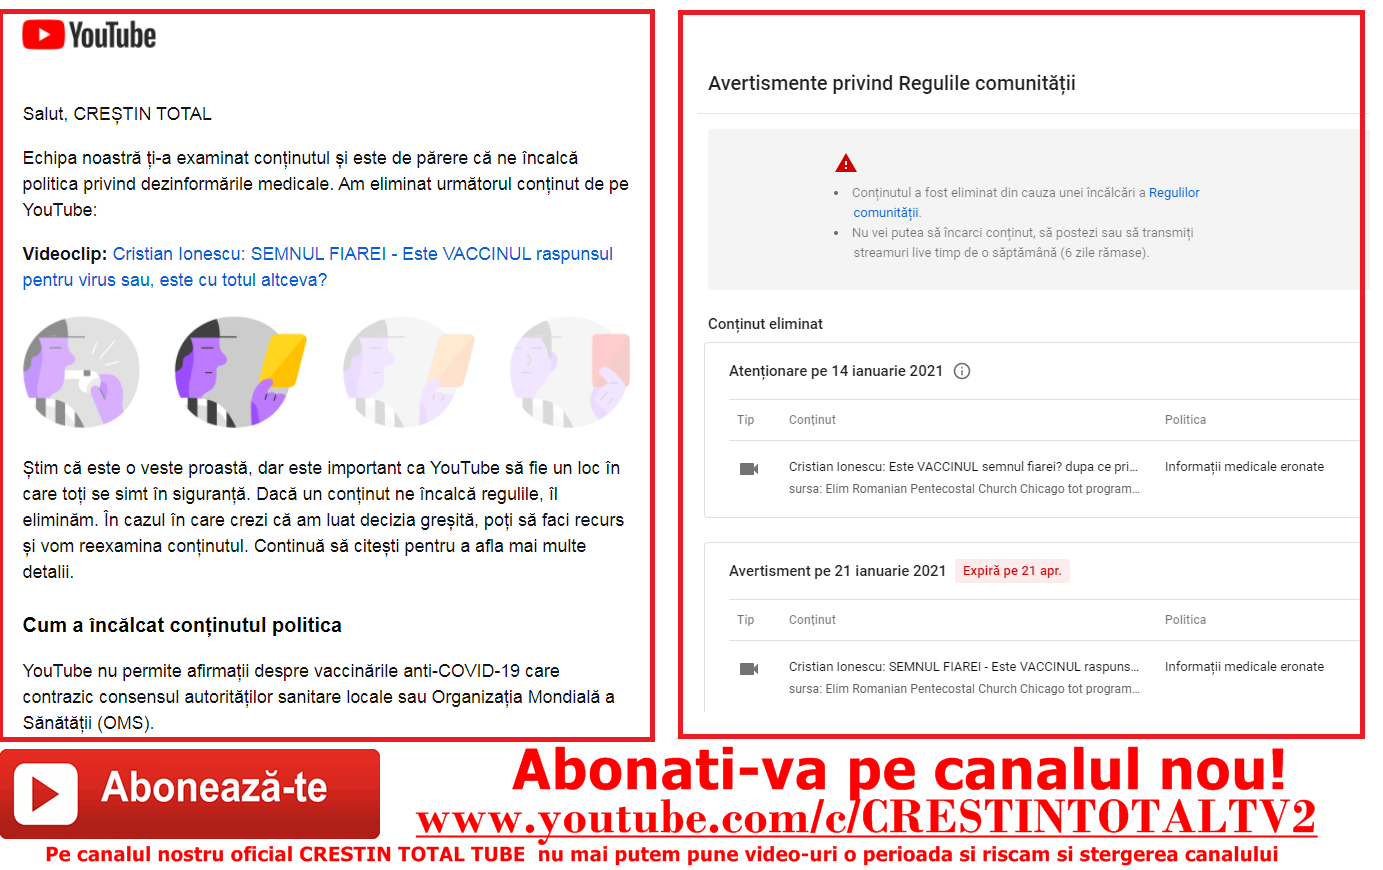 Cenzura! Canalul Crestin total Tube sanctionat de youtube de doua ori in ultima saptamana. Canalul risca sa fie șters de Youtube